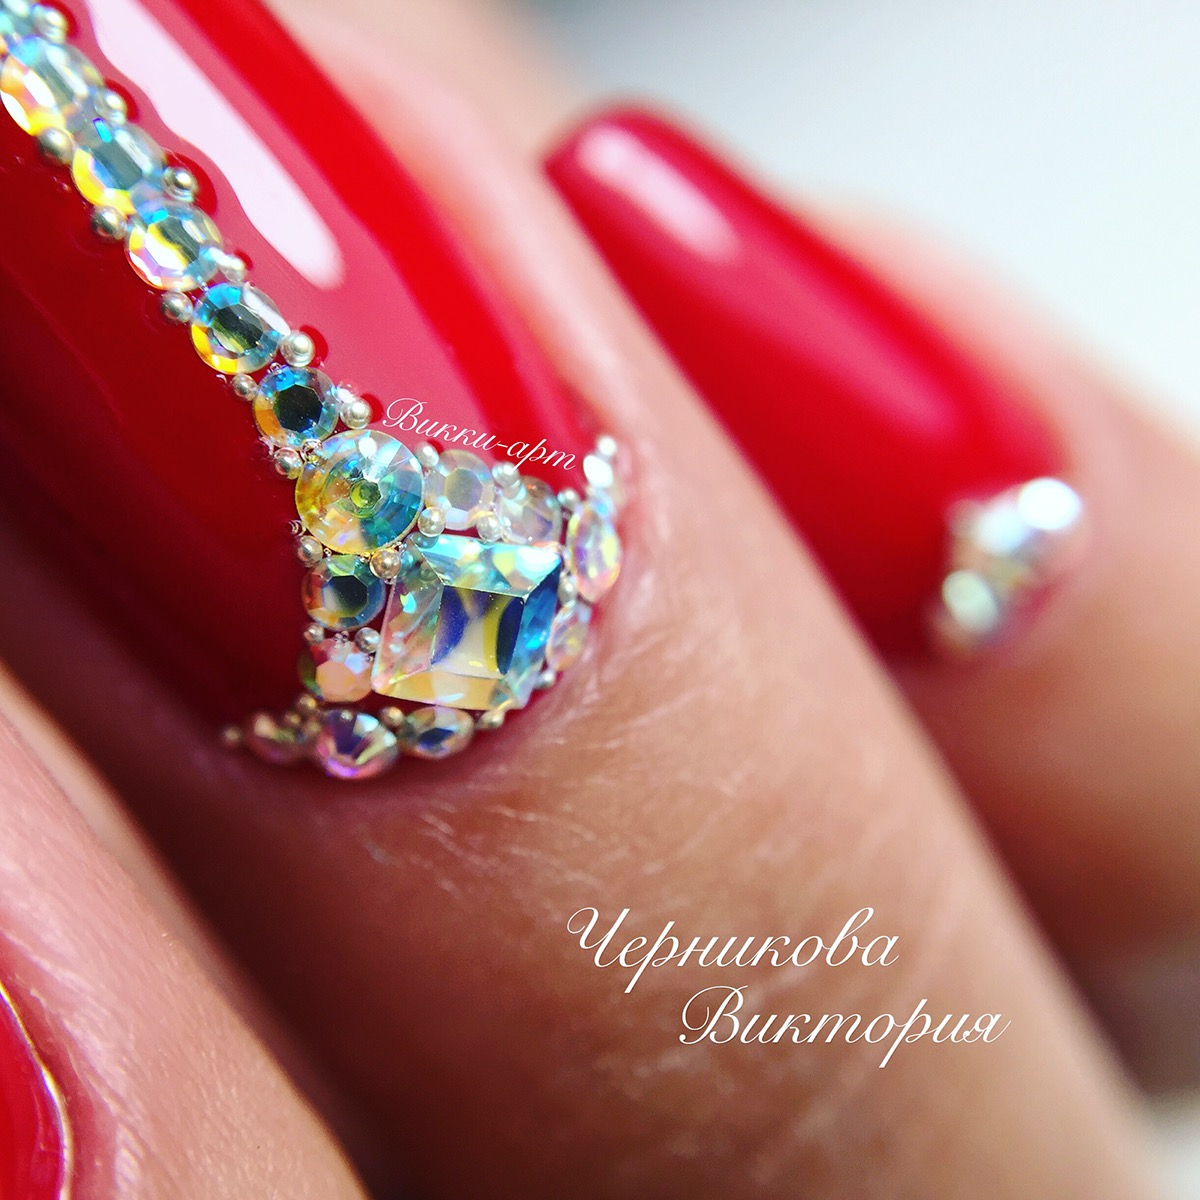 Vikki-art Nail Art Studio on Behance